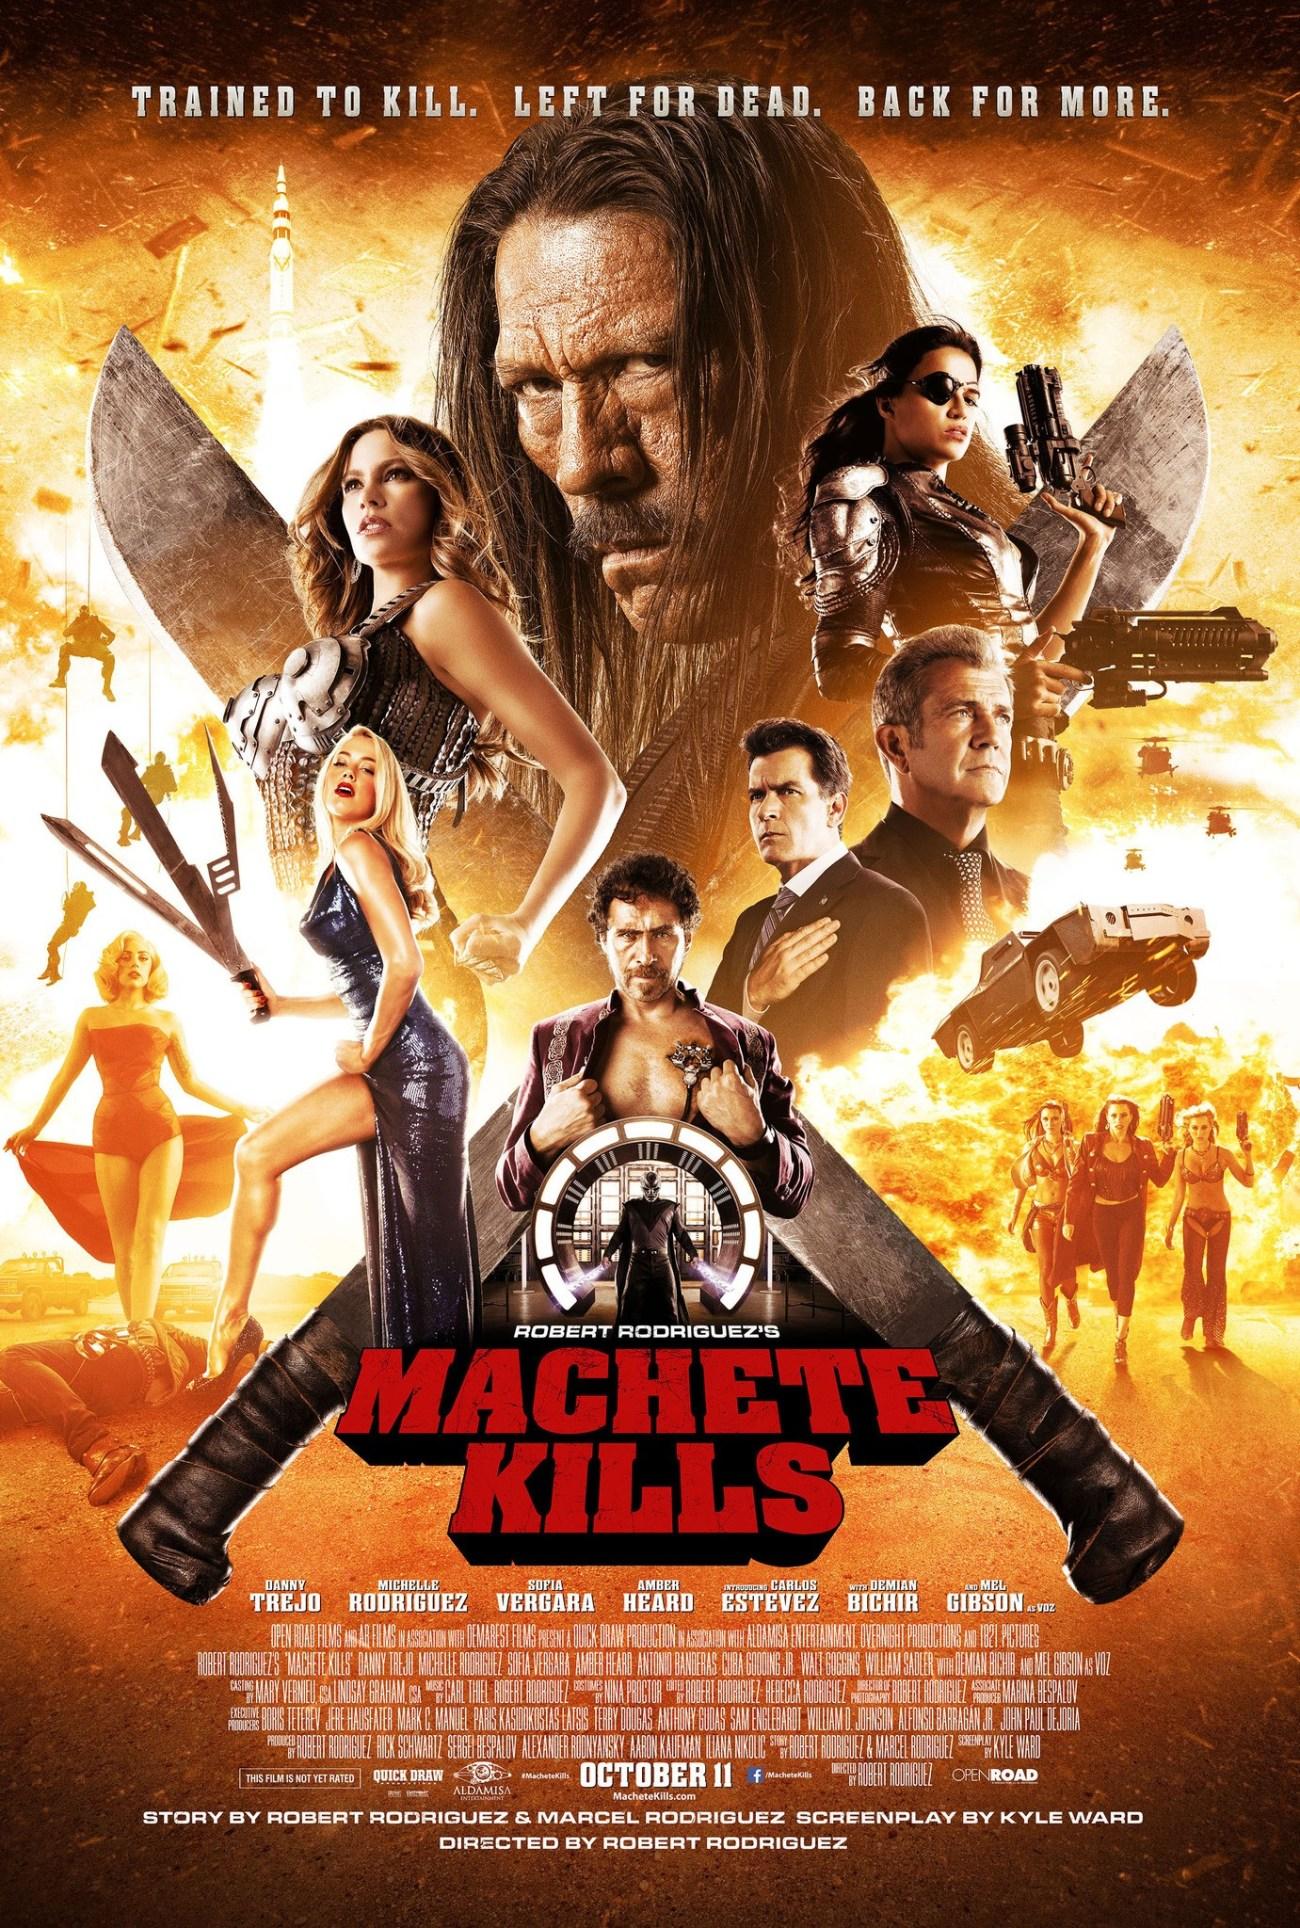 Póster de Machete Kills (2013). Imagen: impawards.com